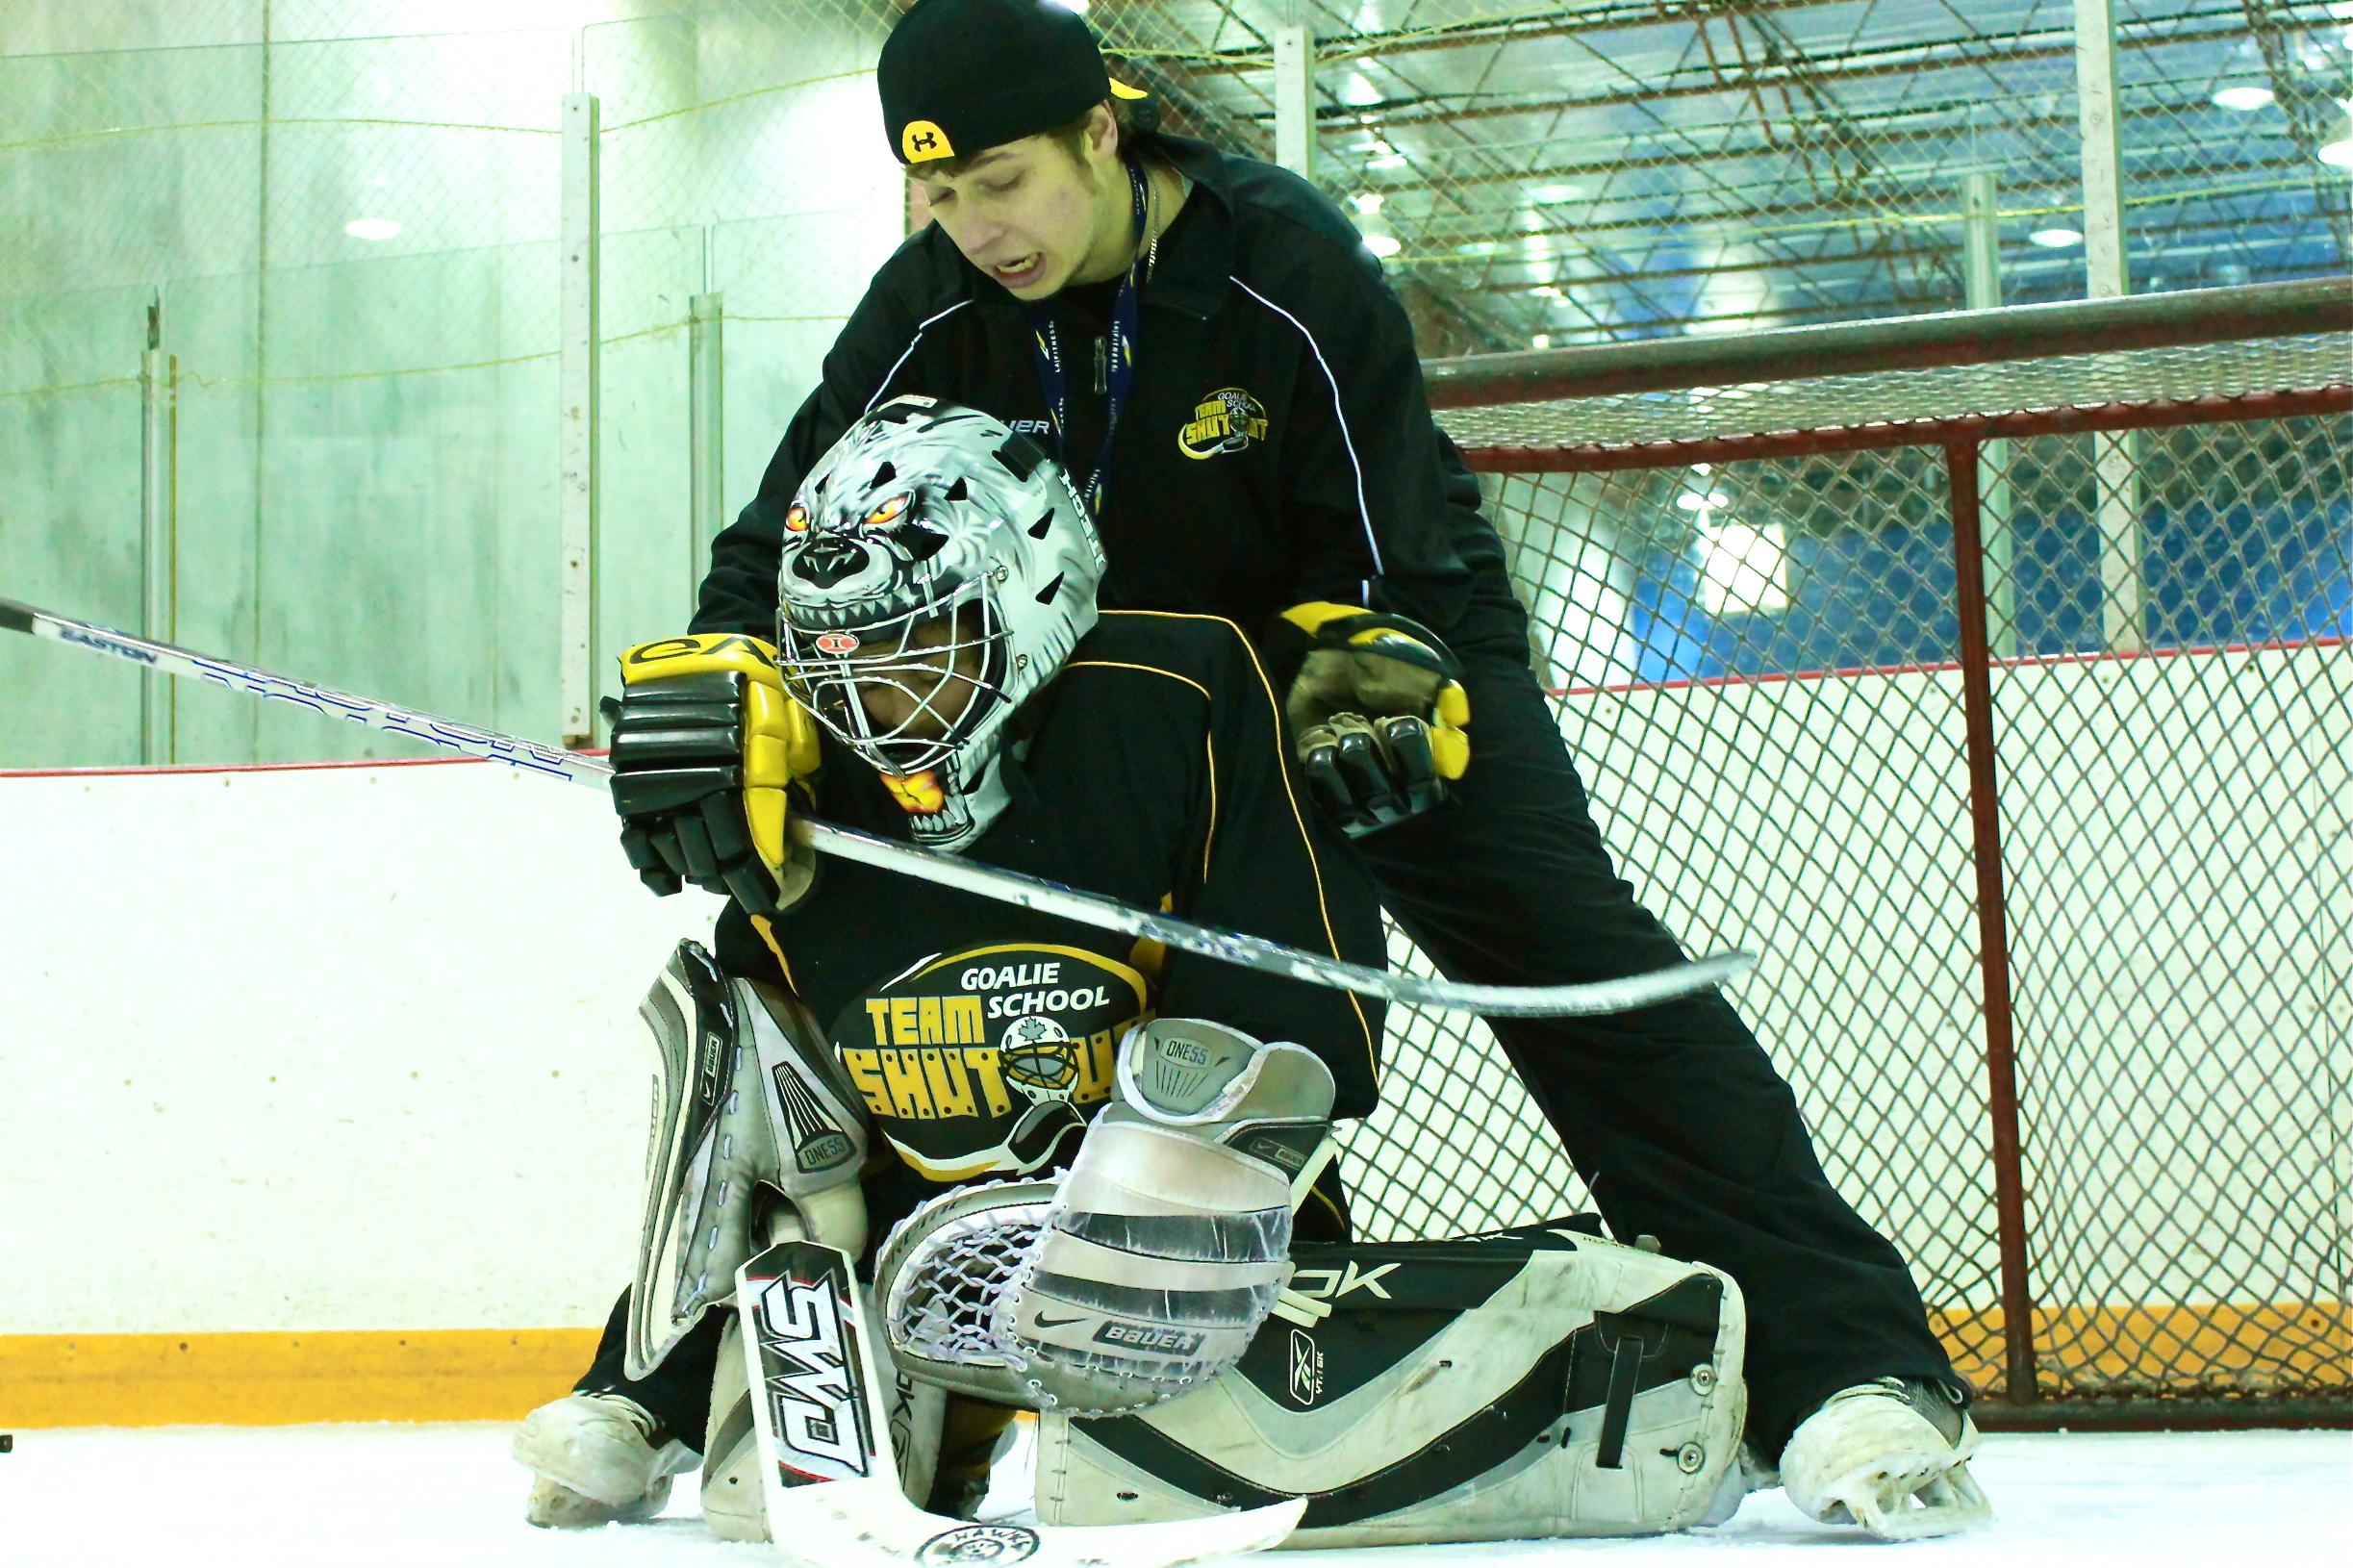 Butterfly Stick Save Drill Modification Team Shutout Goalie School